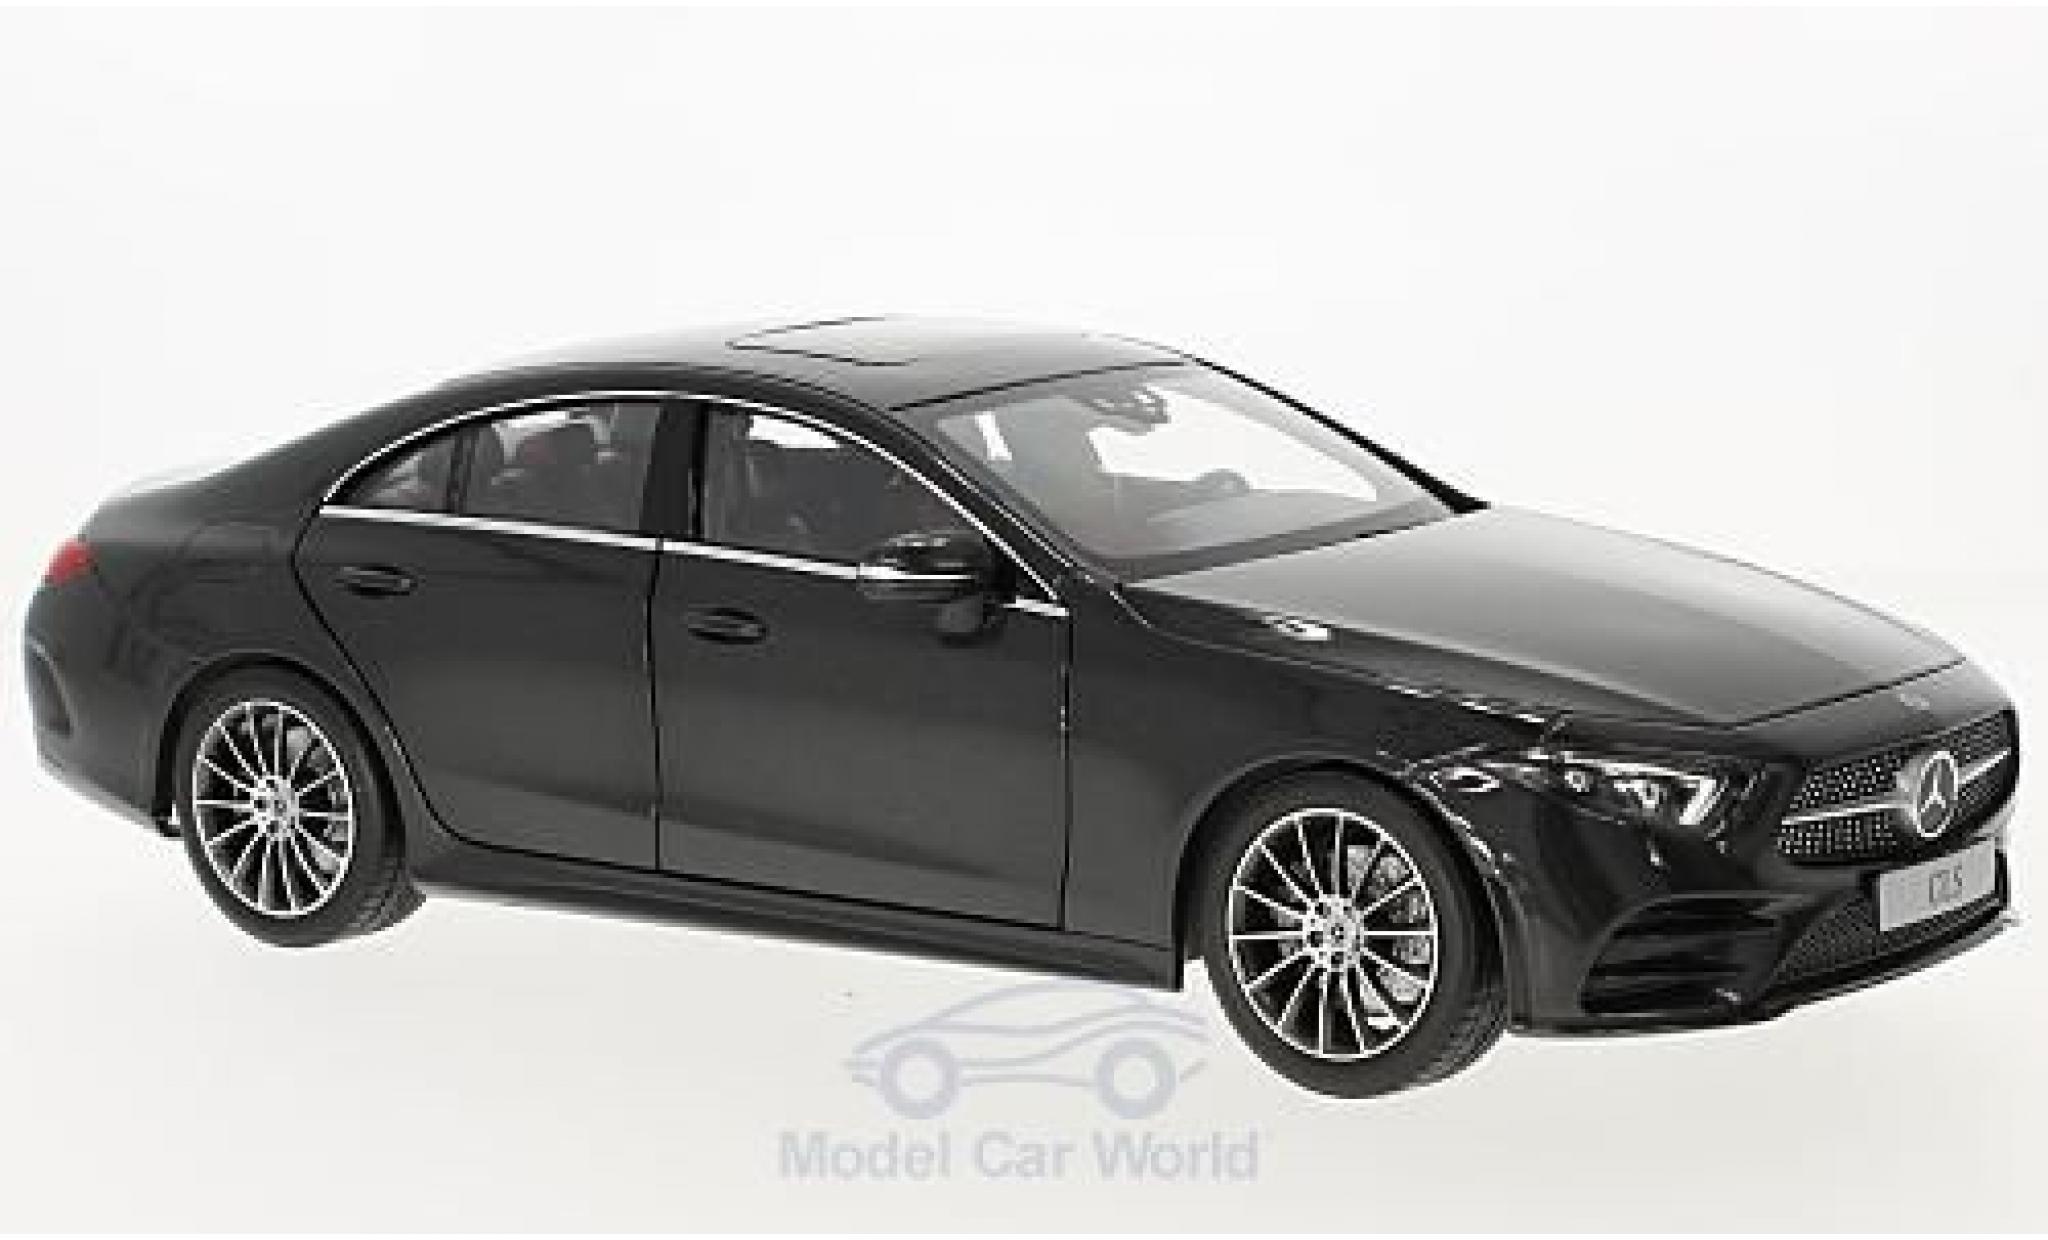 Mercedes CLS 1/18 Norev Coupe (C257) metallise grise 2018